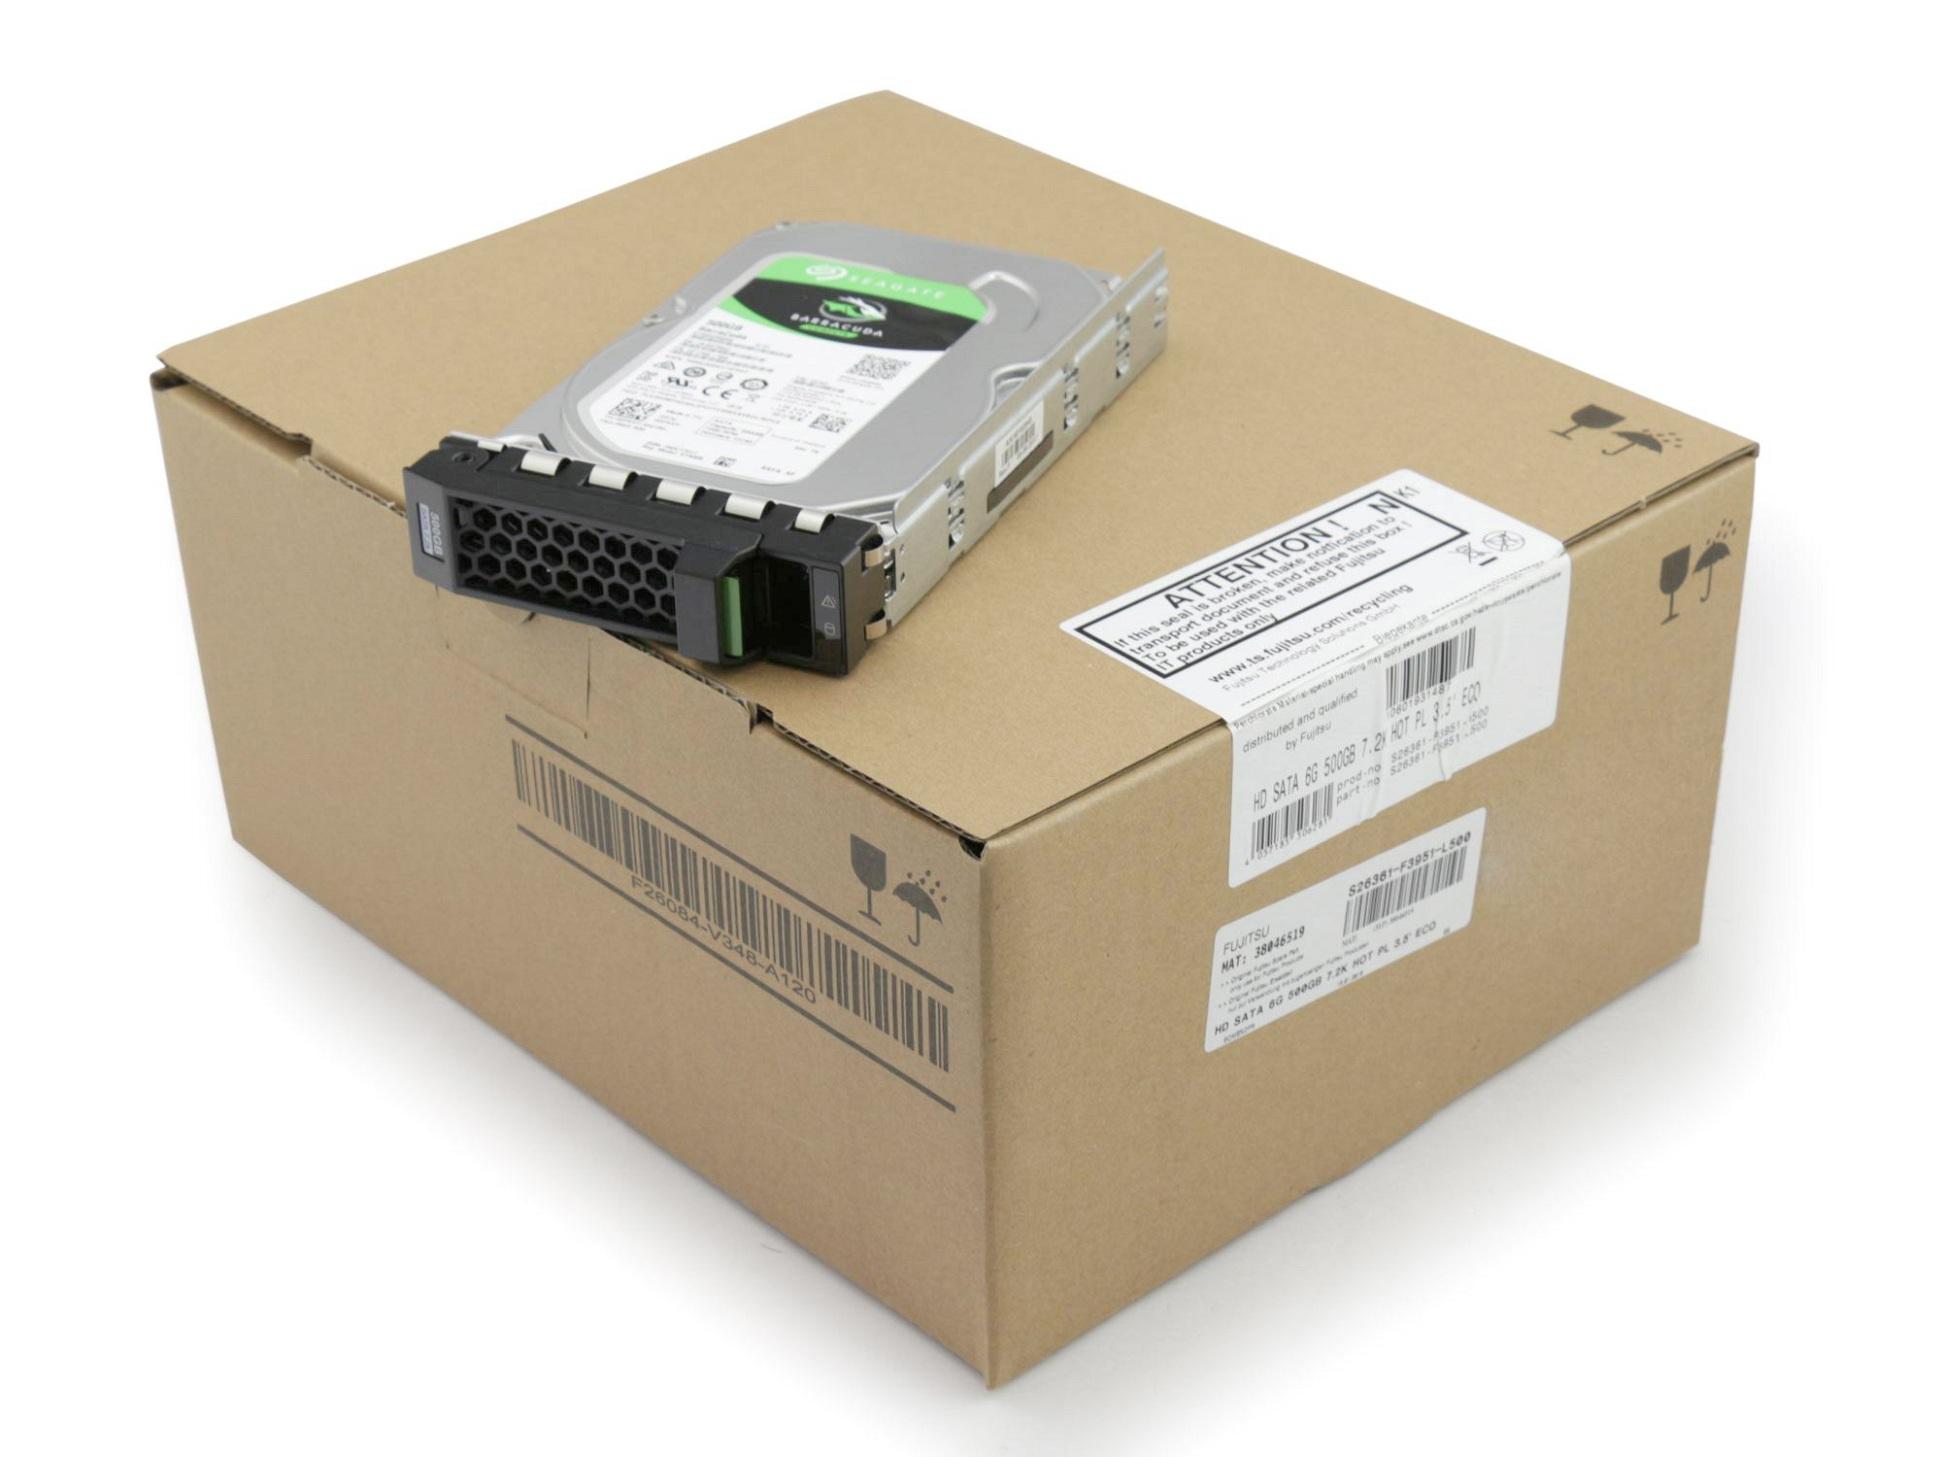 Seagate 1BD142-502 Server Festplatte HDD 500GB (3,5 Zoll / 8,9 cm) S-ATA III (6,0 Gb/s) ECO 7.2K inkl. Hot-Plug